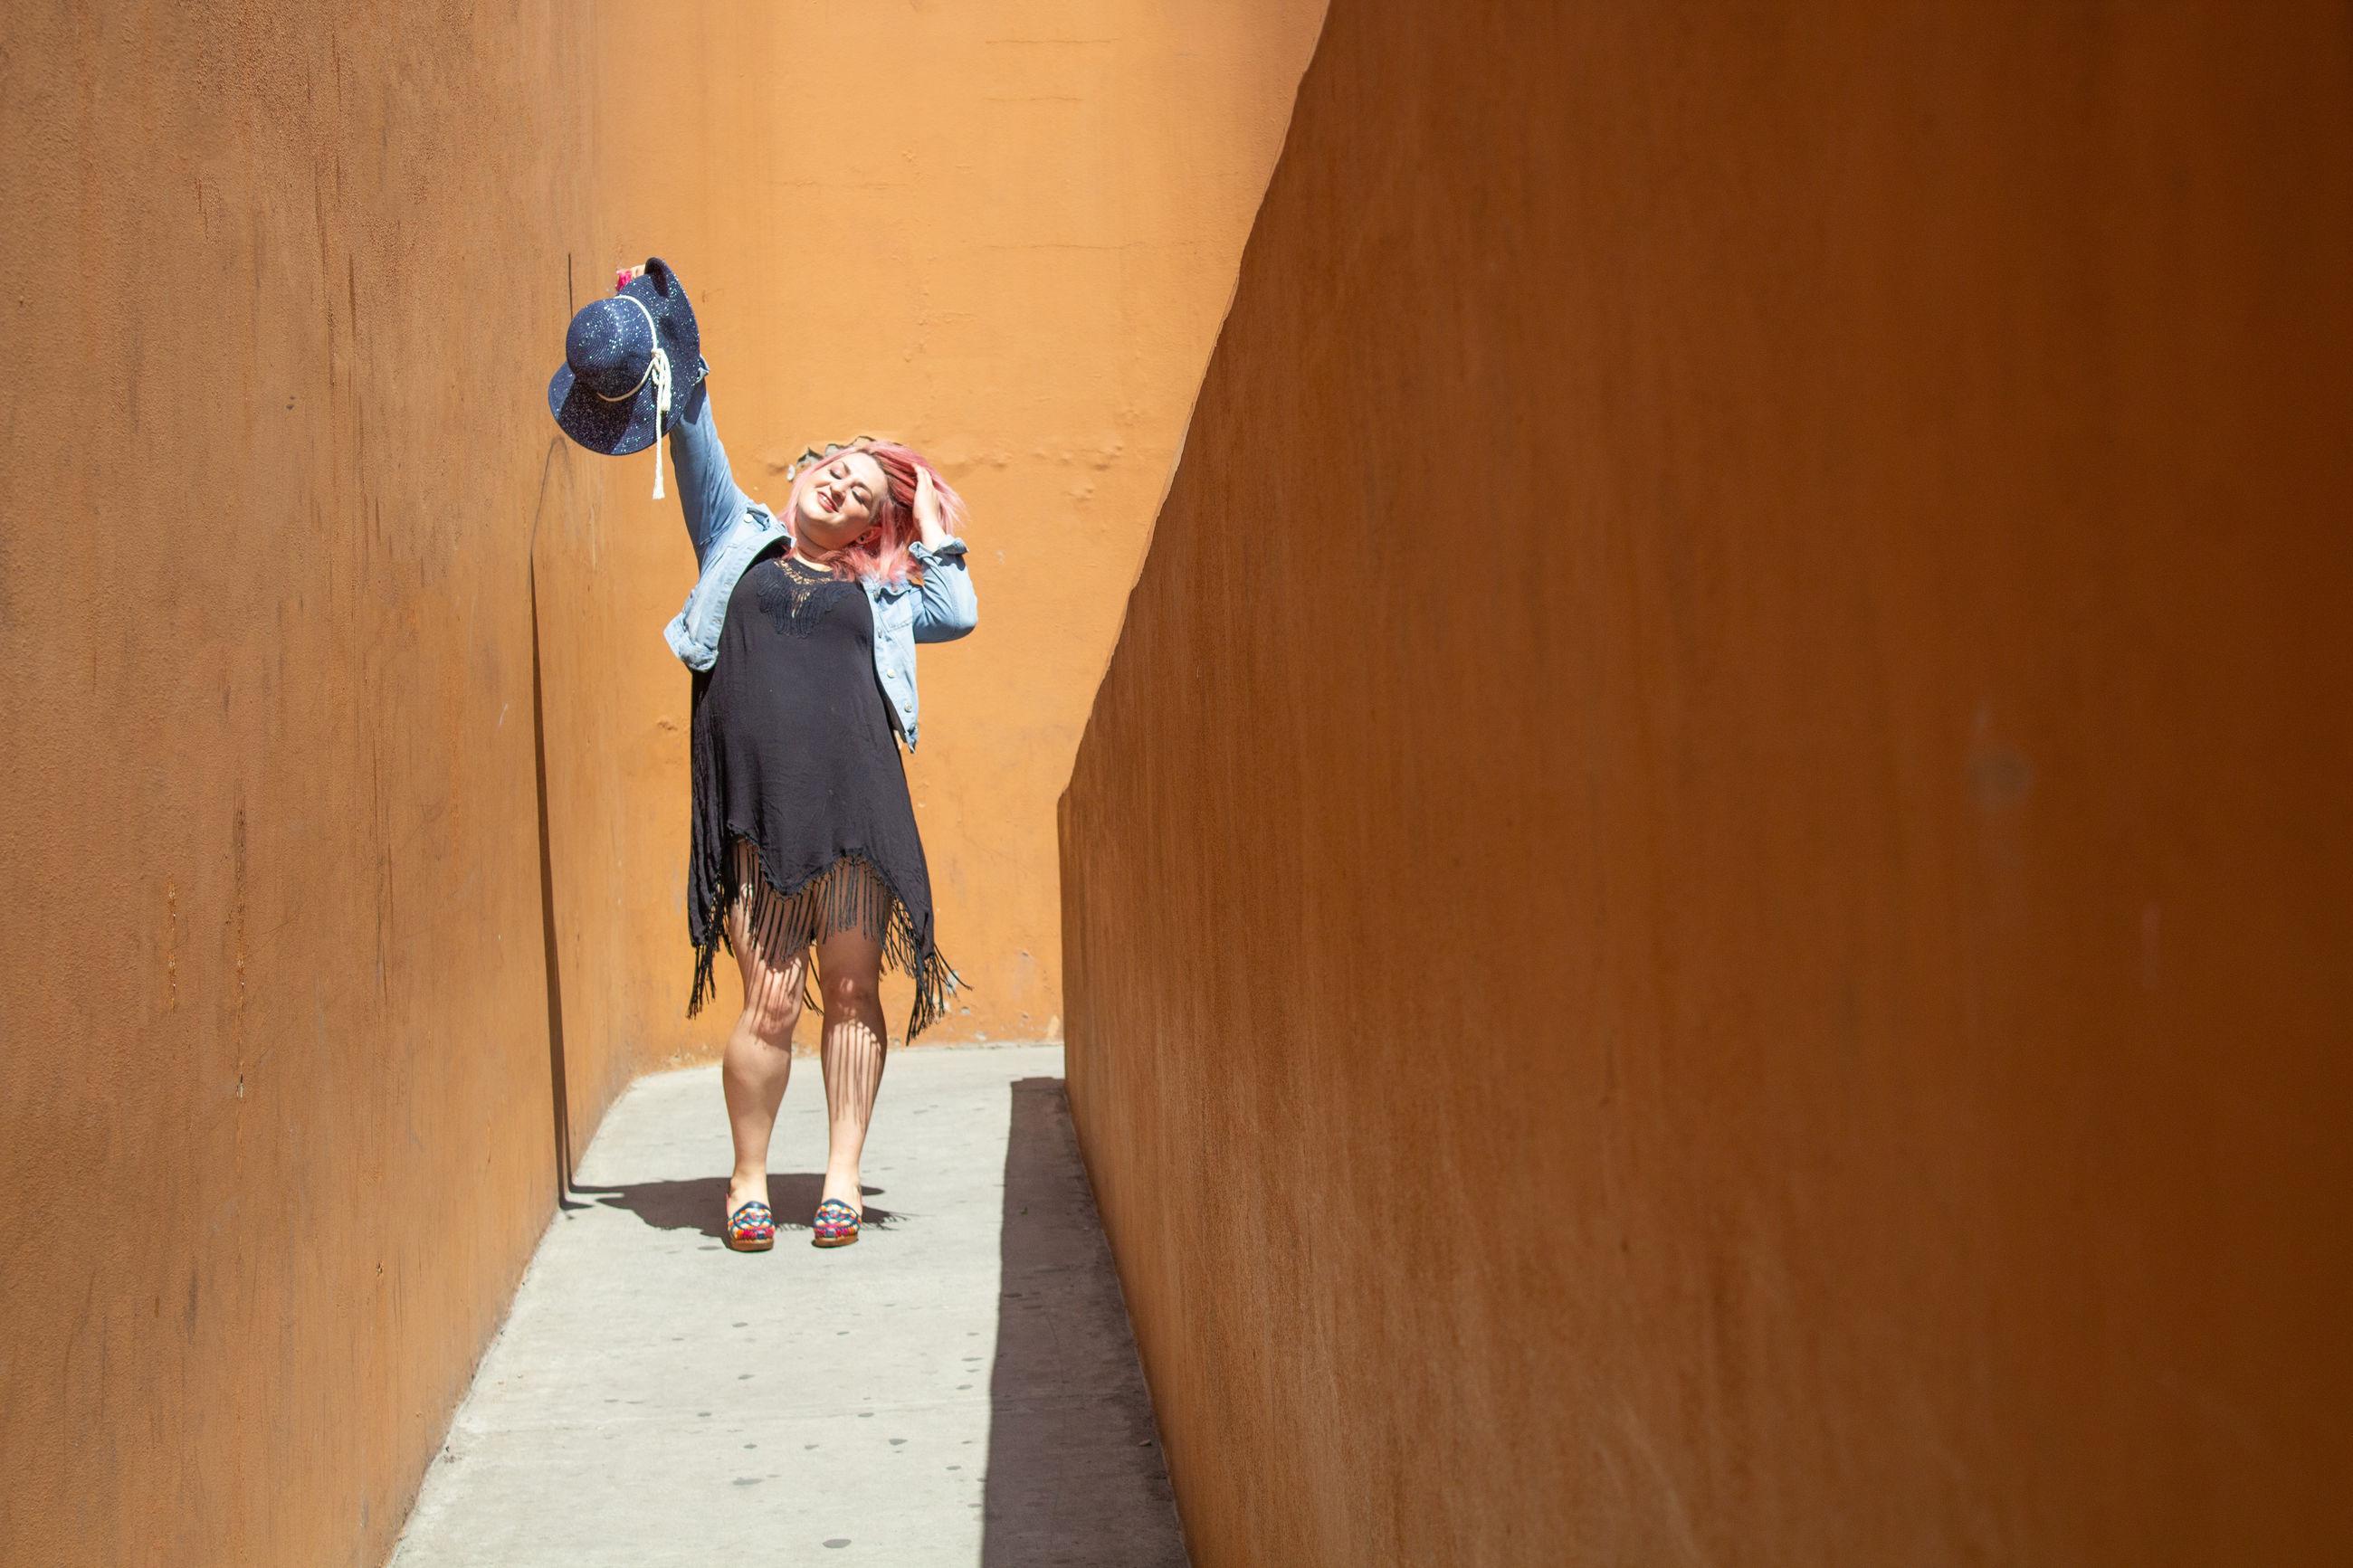 Happy woman walking in orange tunnel moving her hat